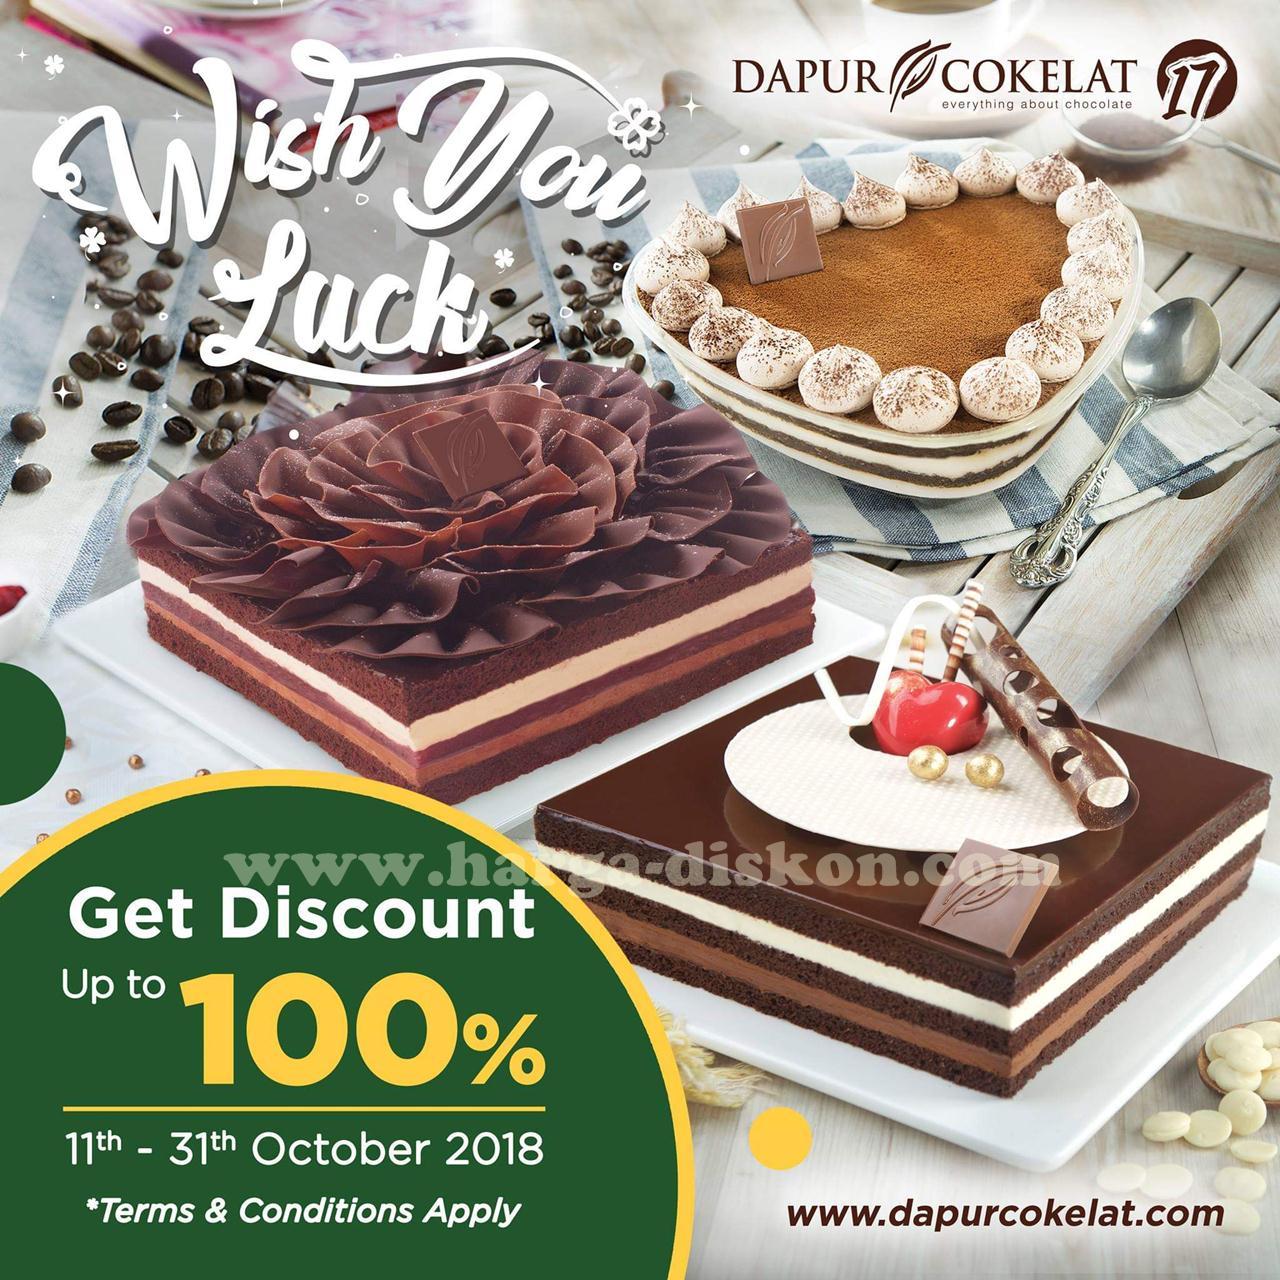 Promo Dapur Cokelat Diskon Hingga 100 Periode 11 31 Oktober 2018